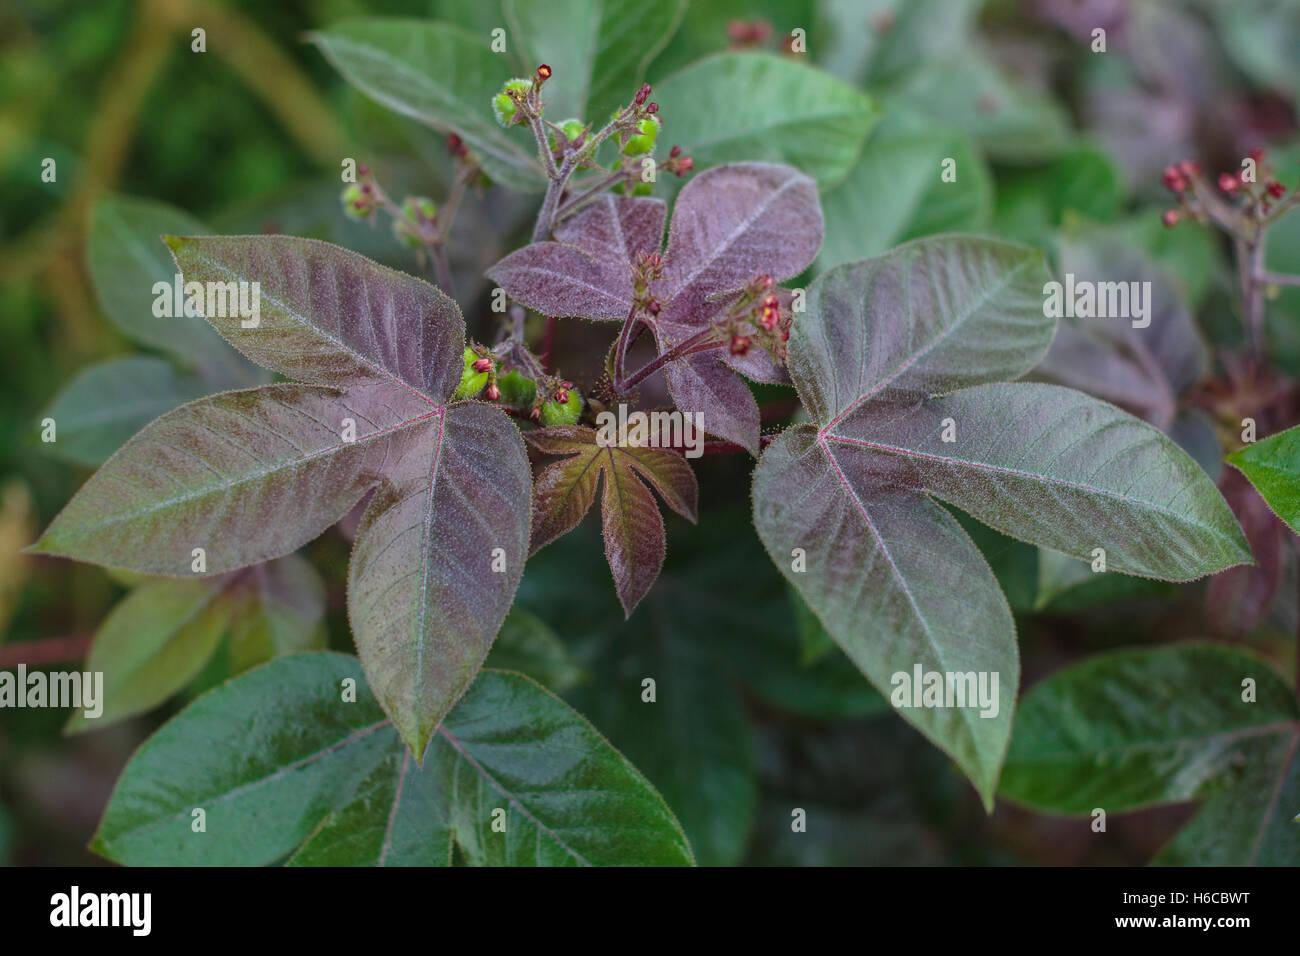 A Jatropha gossypiifolia plant, aka pinon colorado, growing in the